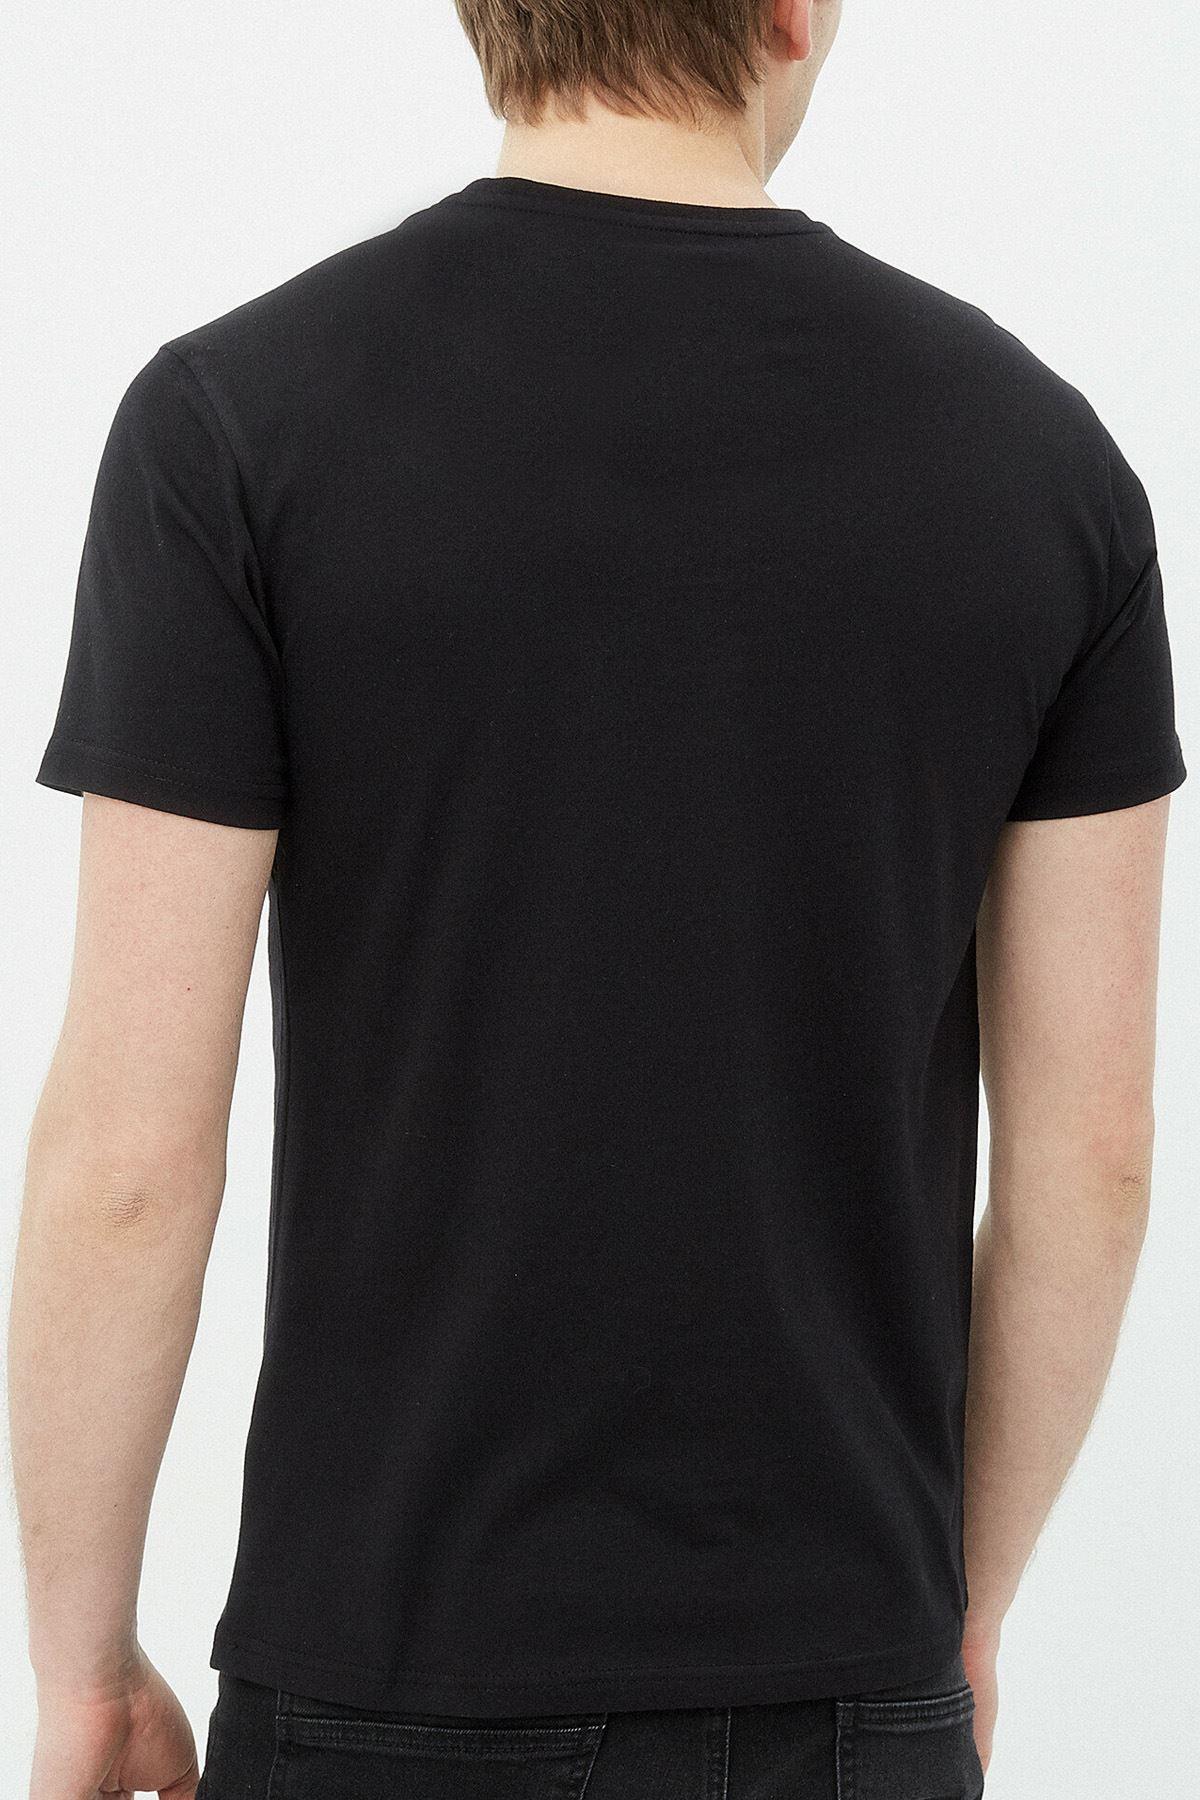 Anime Bang Siyah Erkek Tshirt - Tişört